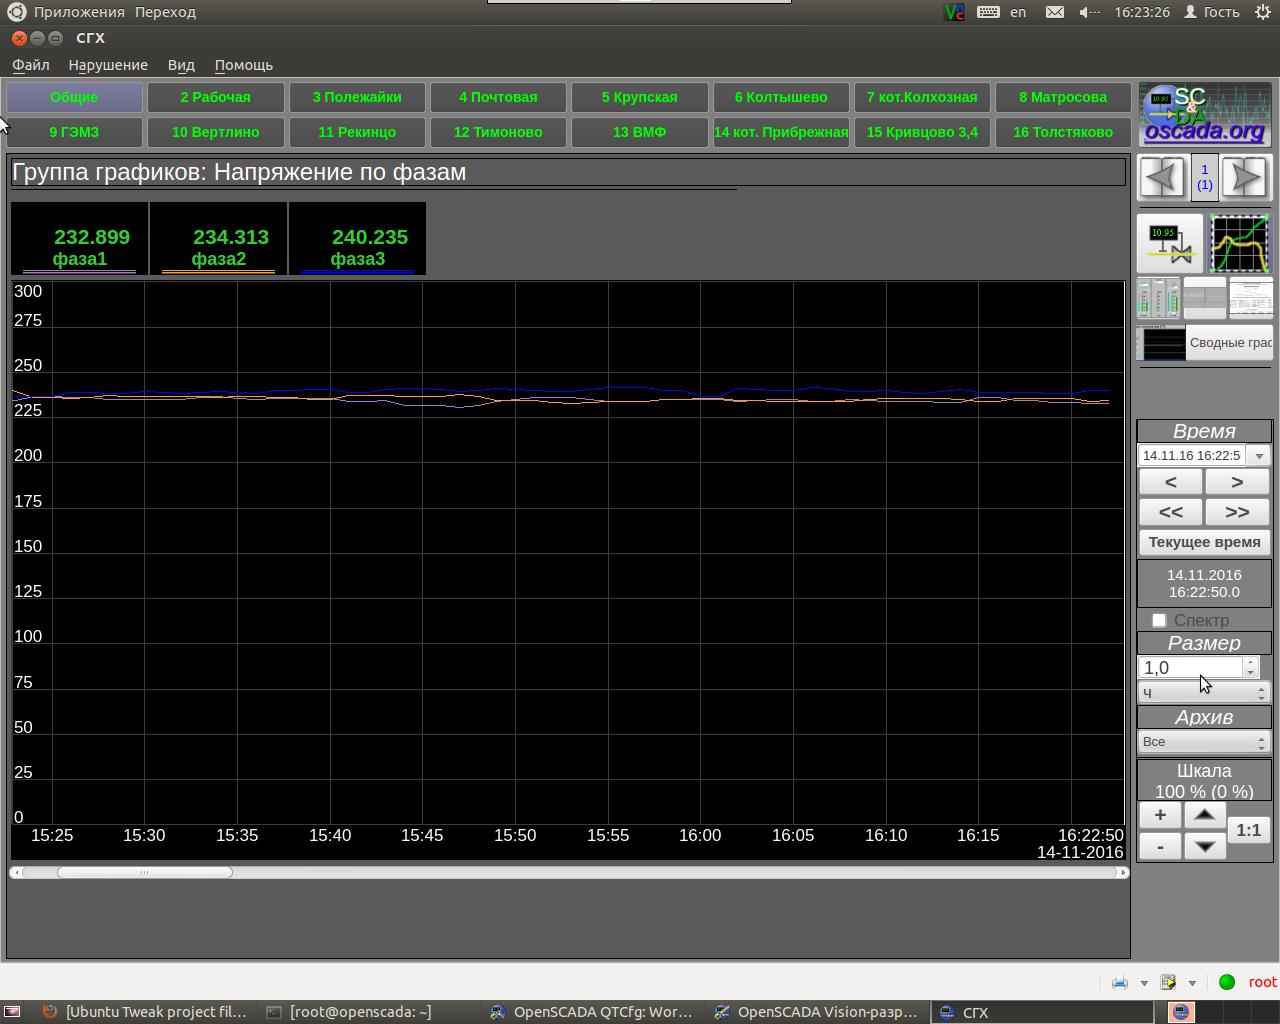 Пишем протоколы счетчиков Меркурий 230 и Меркурий 200 для OpenSCADA - 22